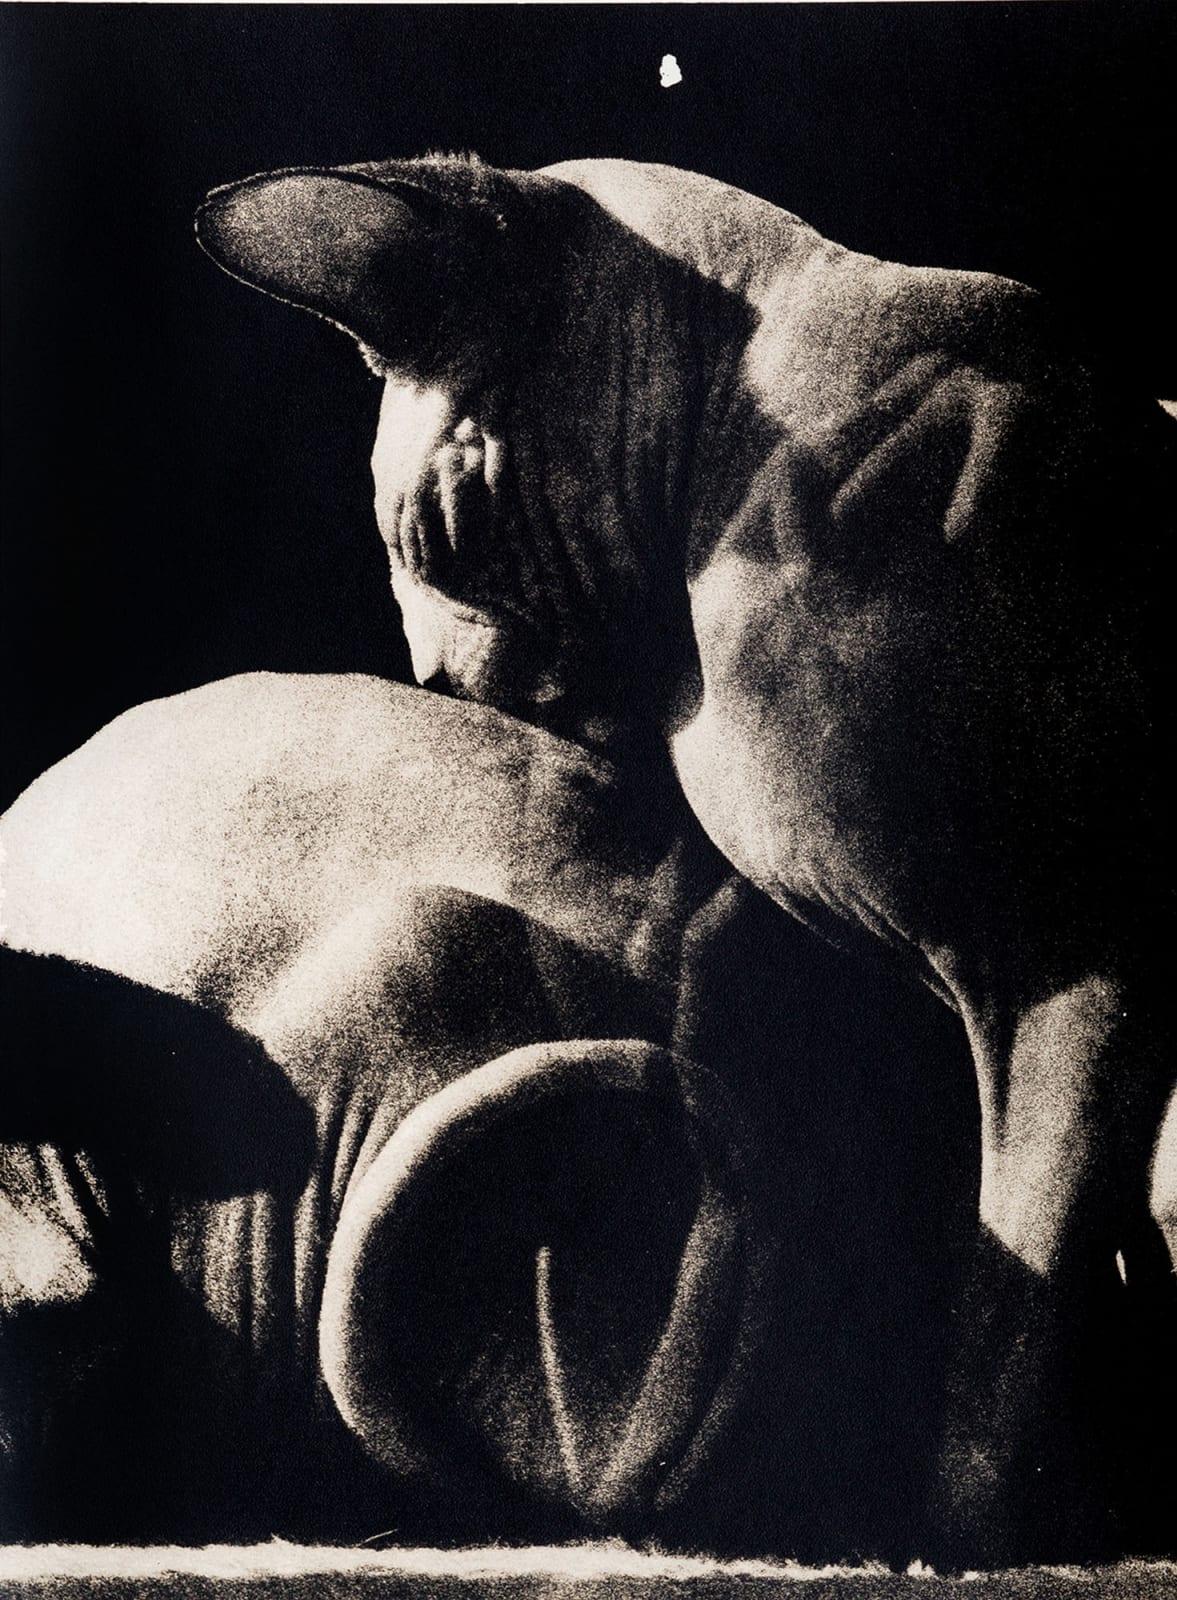 Andrej Lamut, Sphinx, 2018